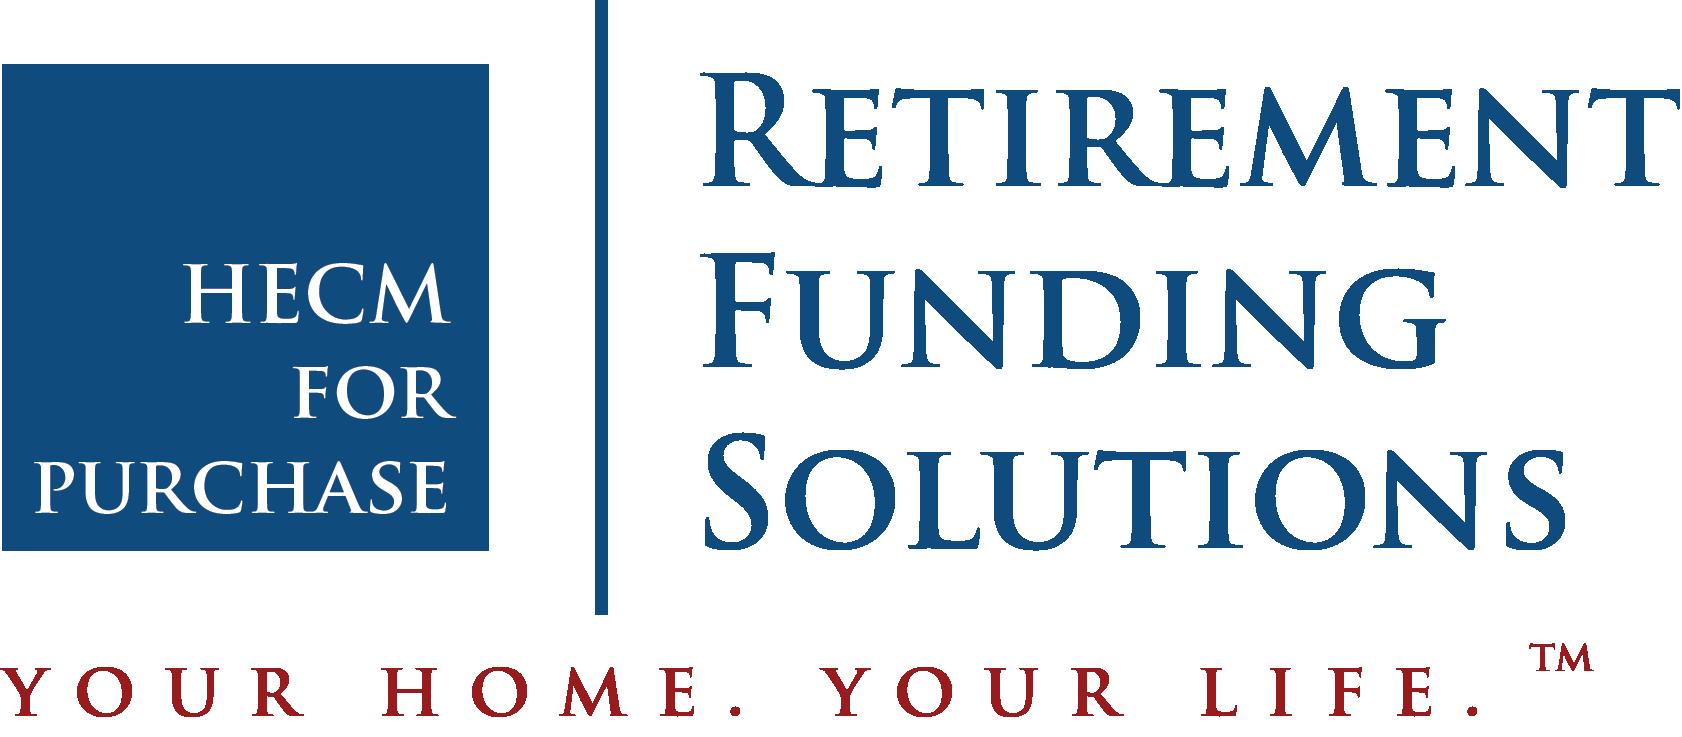 Retirement Funding Solution